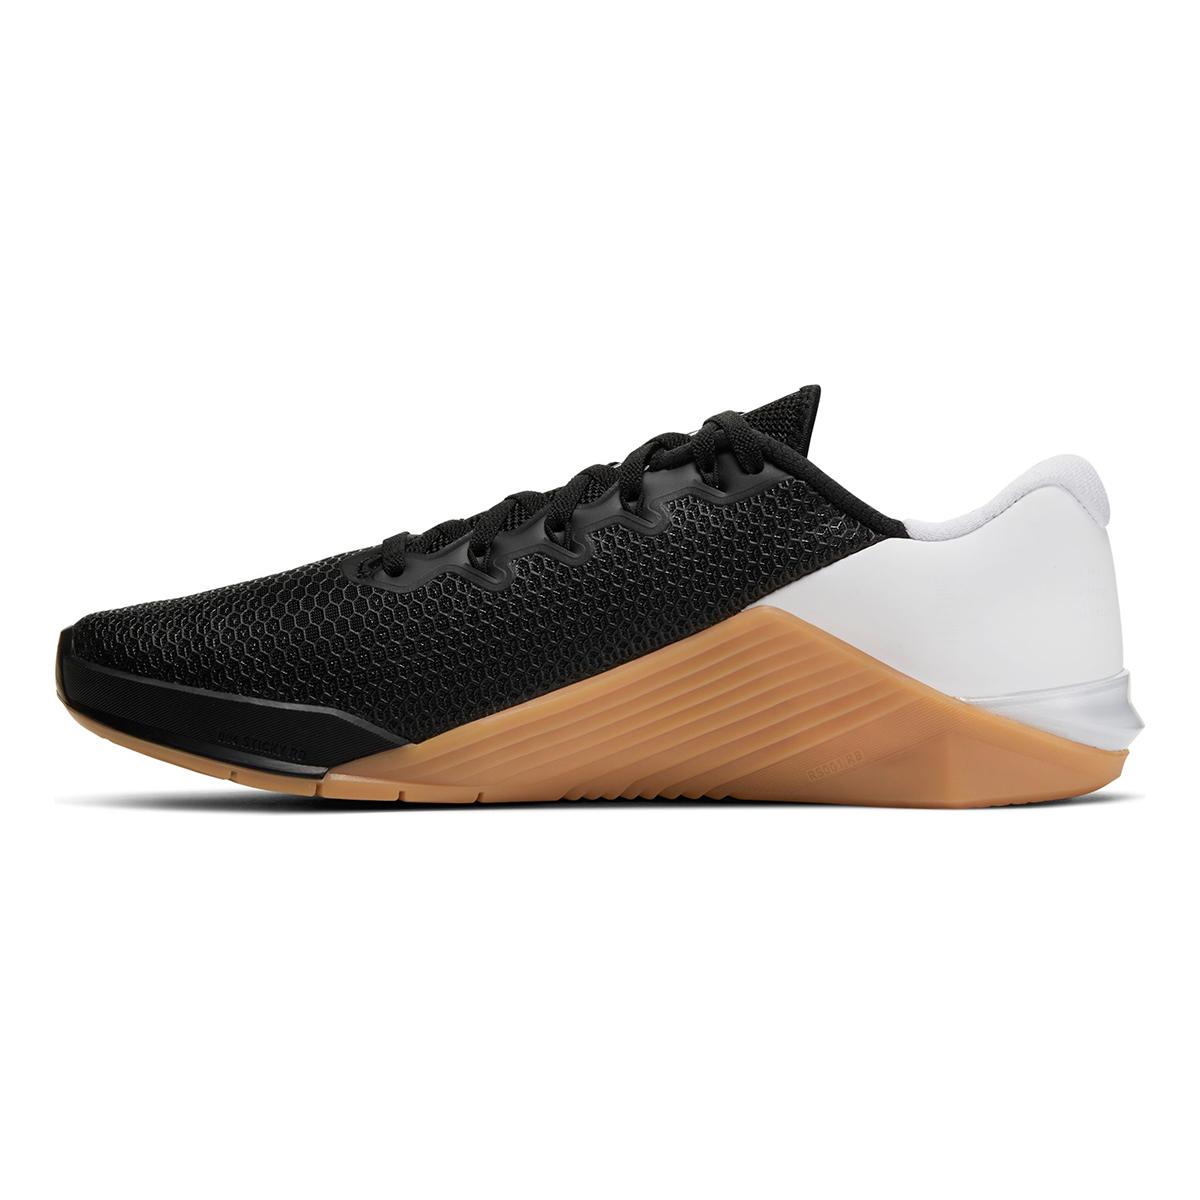 Men's Nike Metcon 5 Training Shoes  - Color: Black/White/Gum Med Brown - Size: 5 - Width: Regular, Black/White/Gum Med Brown, large, image 2